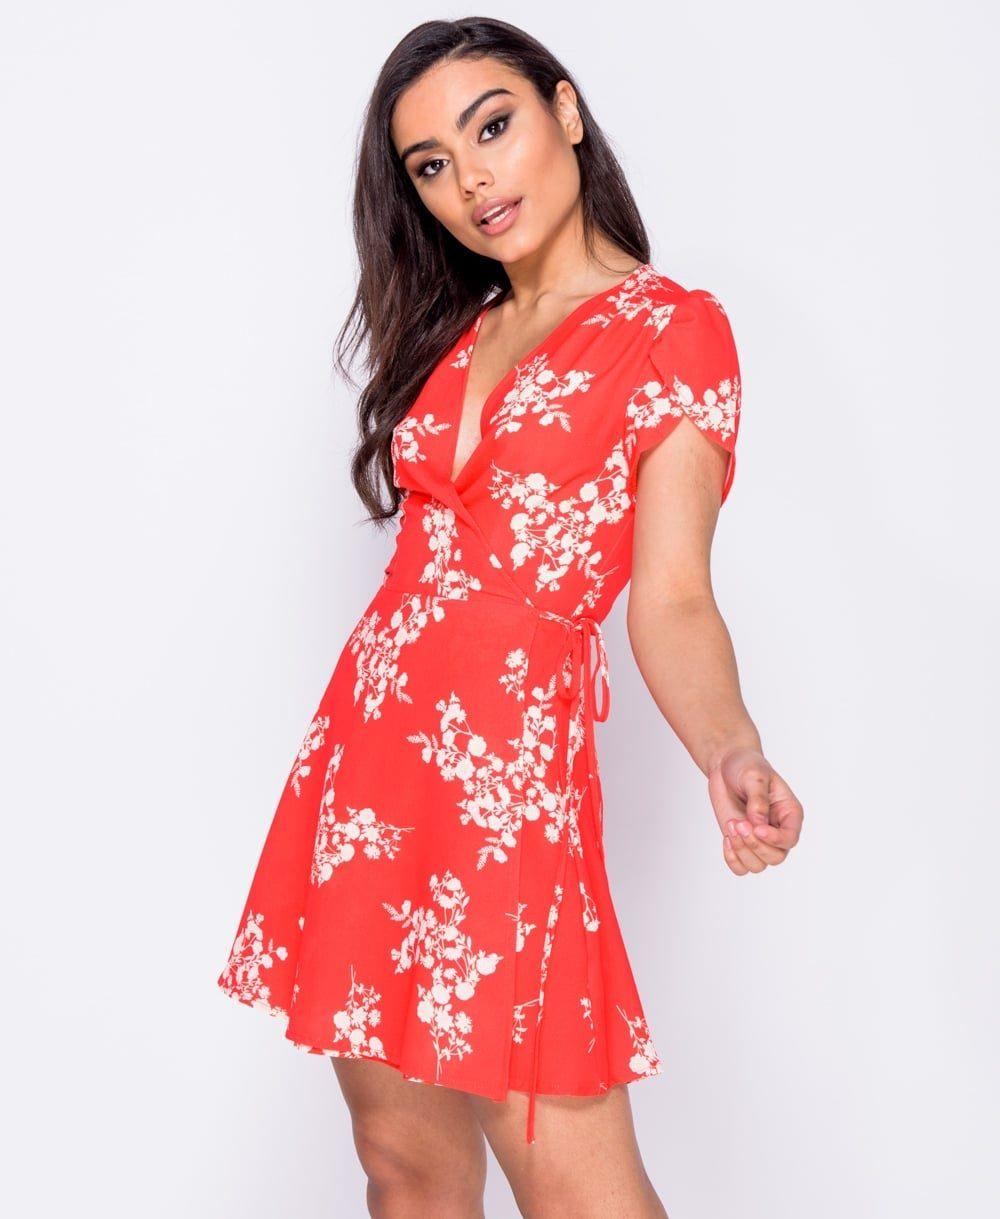 Floral v neck mini dress Online shopping mauritius